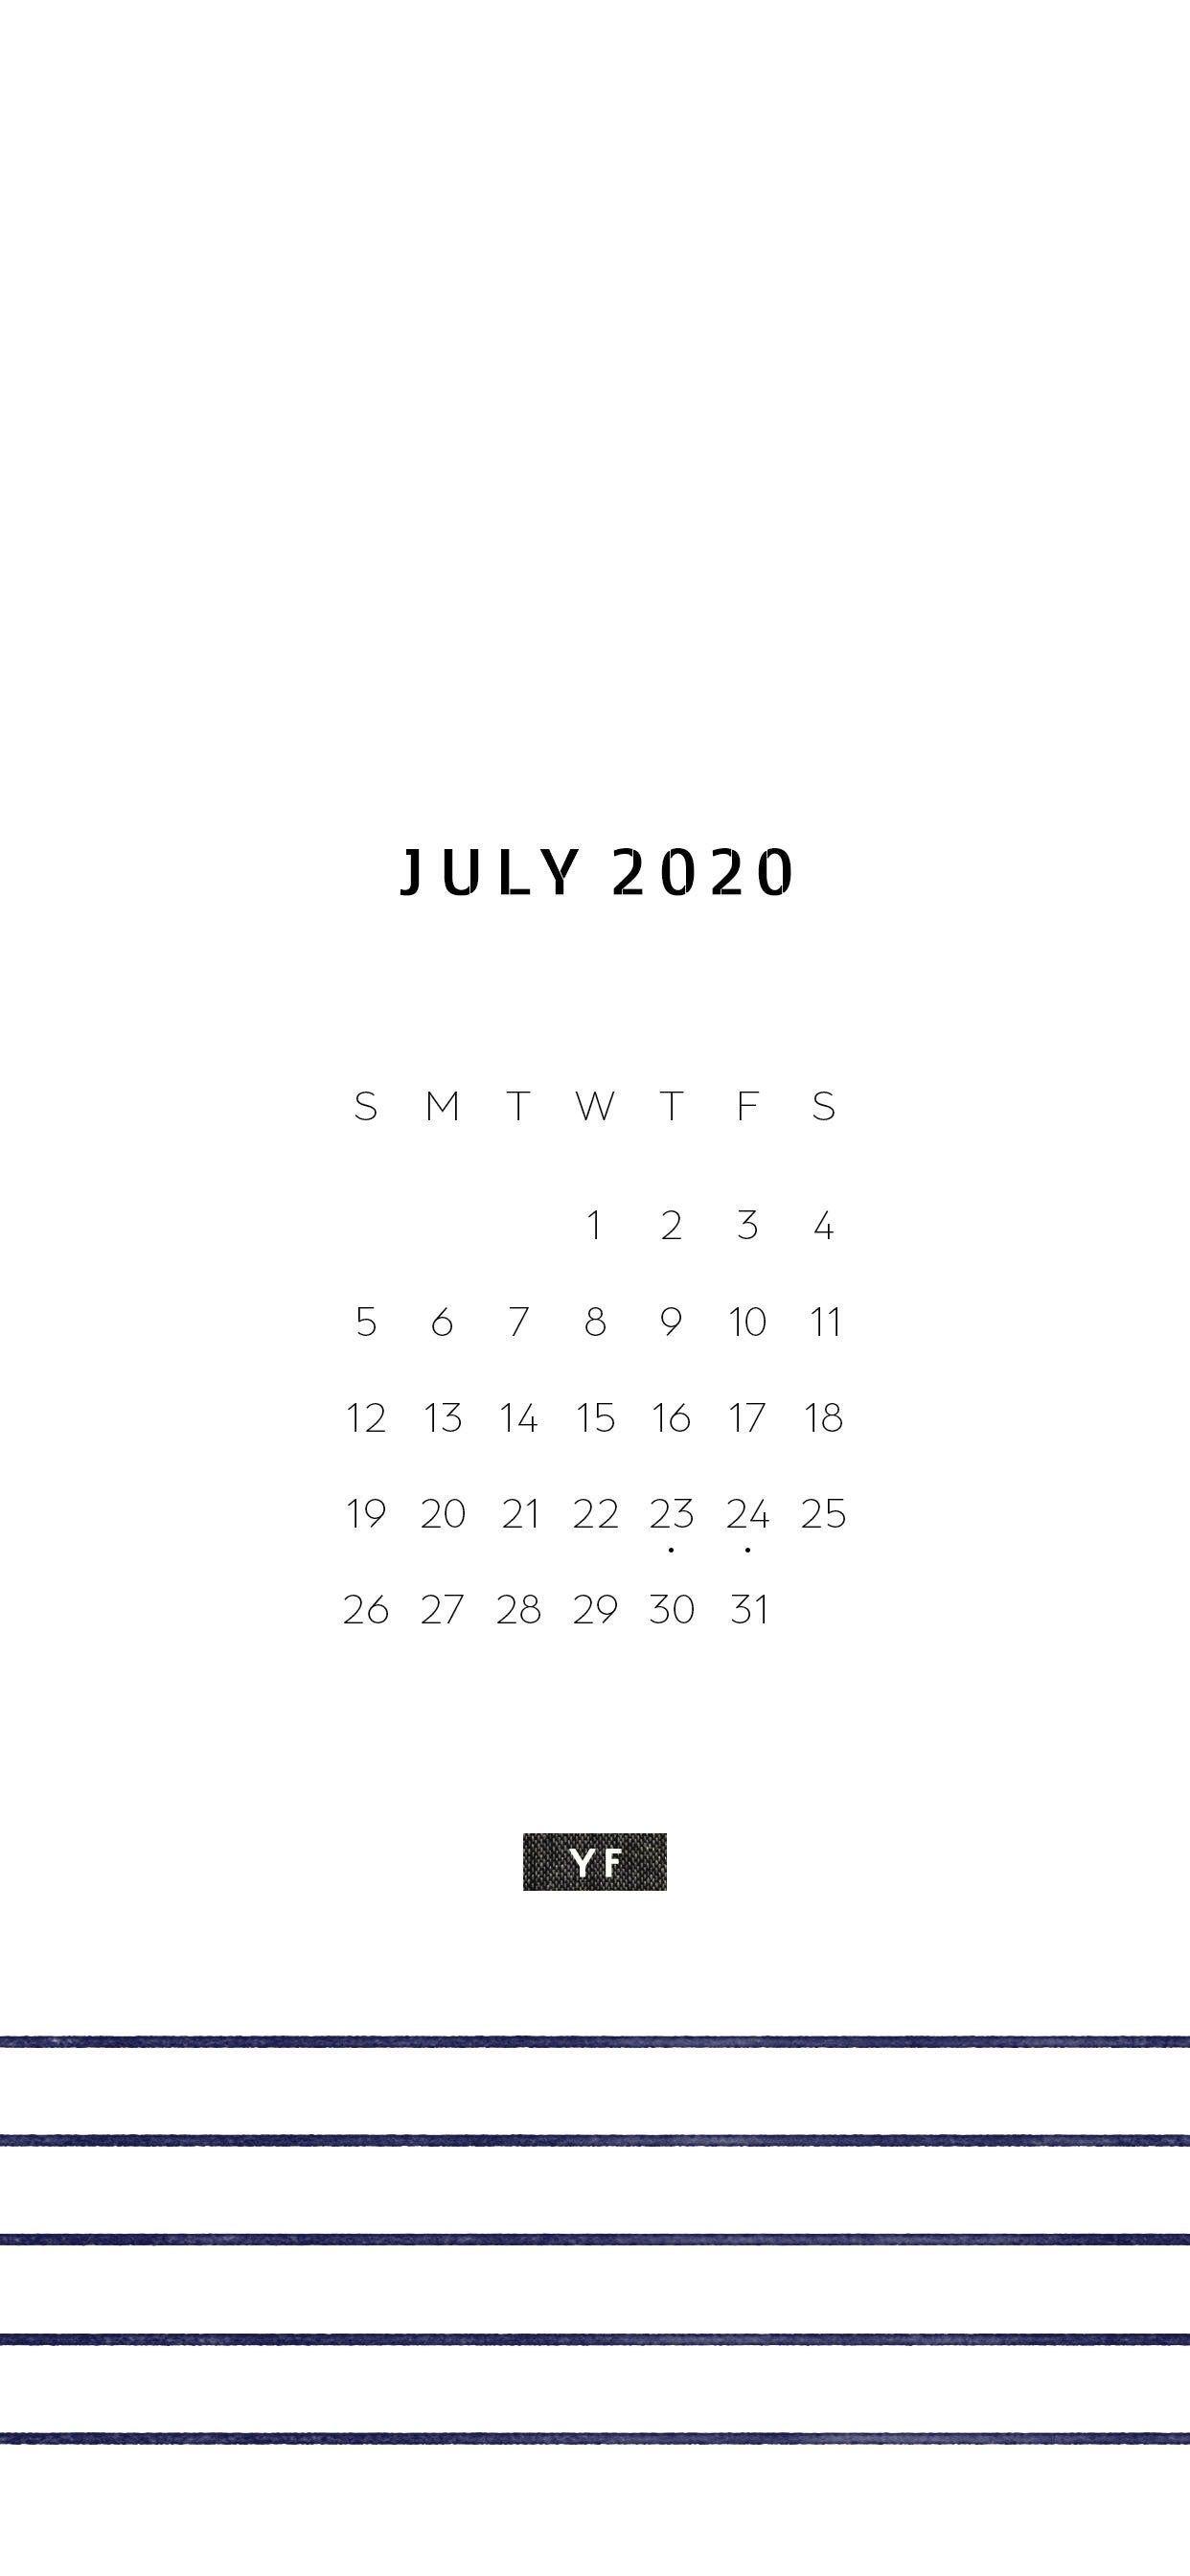 Free Iphone July Calendar 𝗬 𝗙 Note カレンダー 壁紙 長押